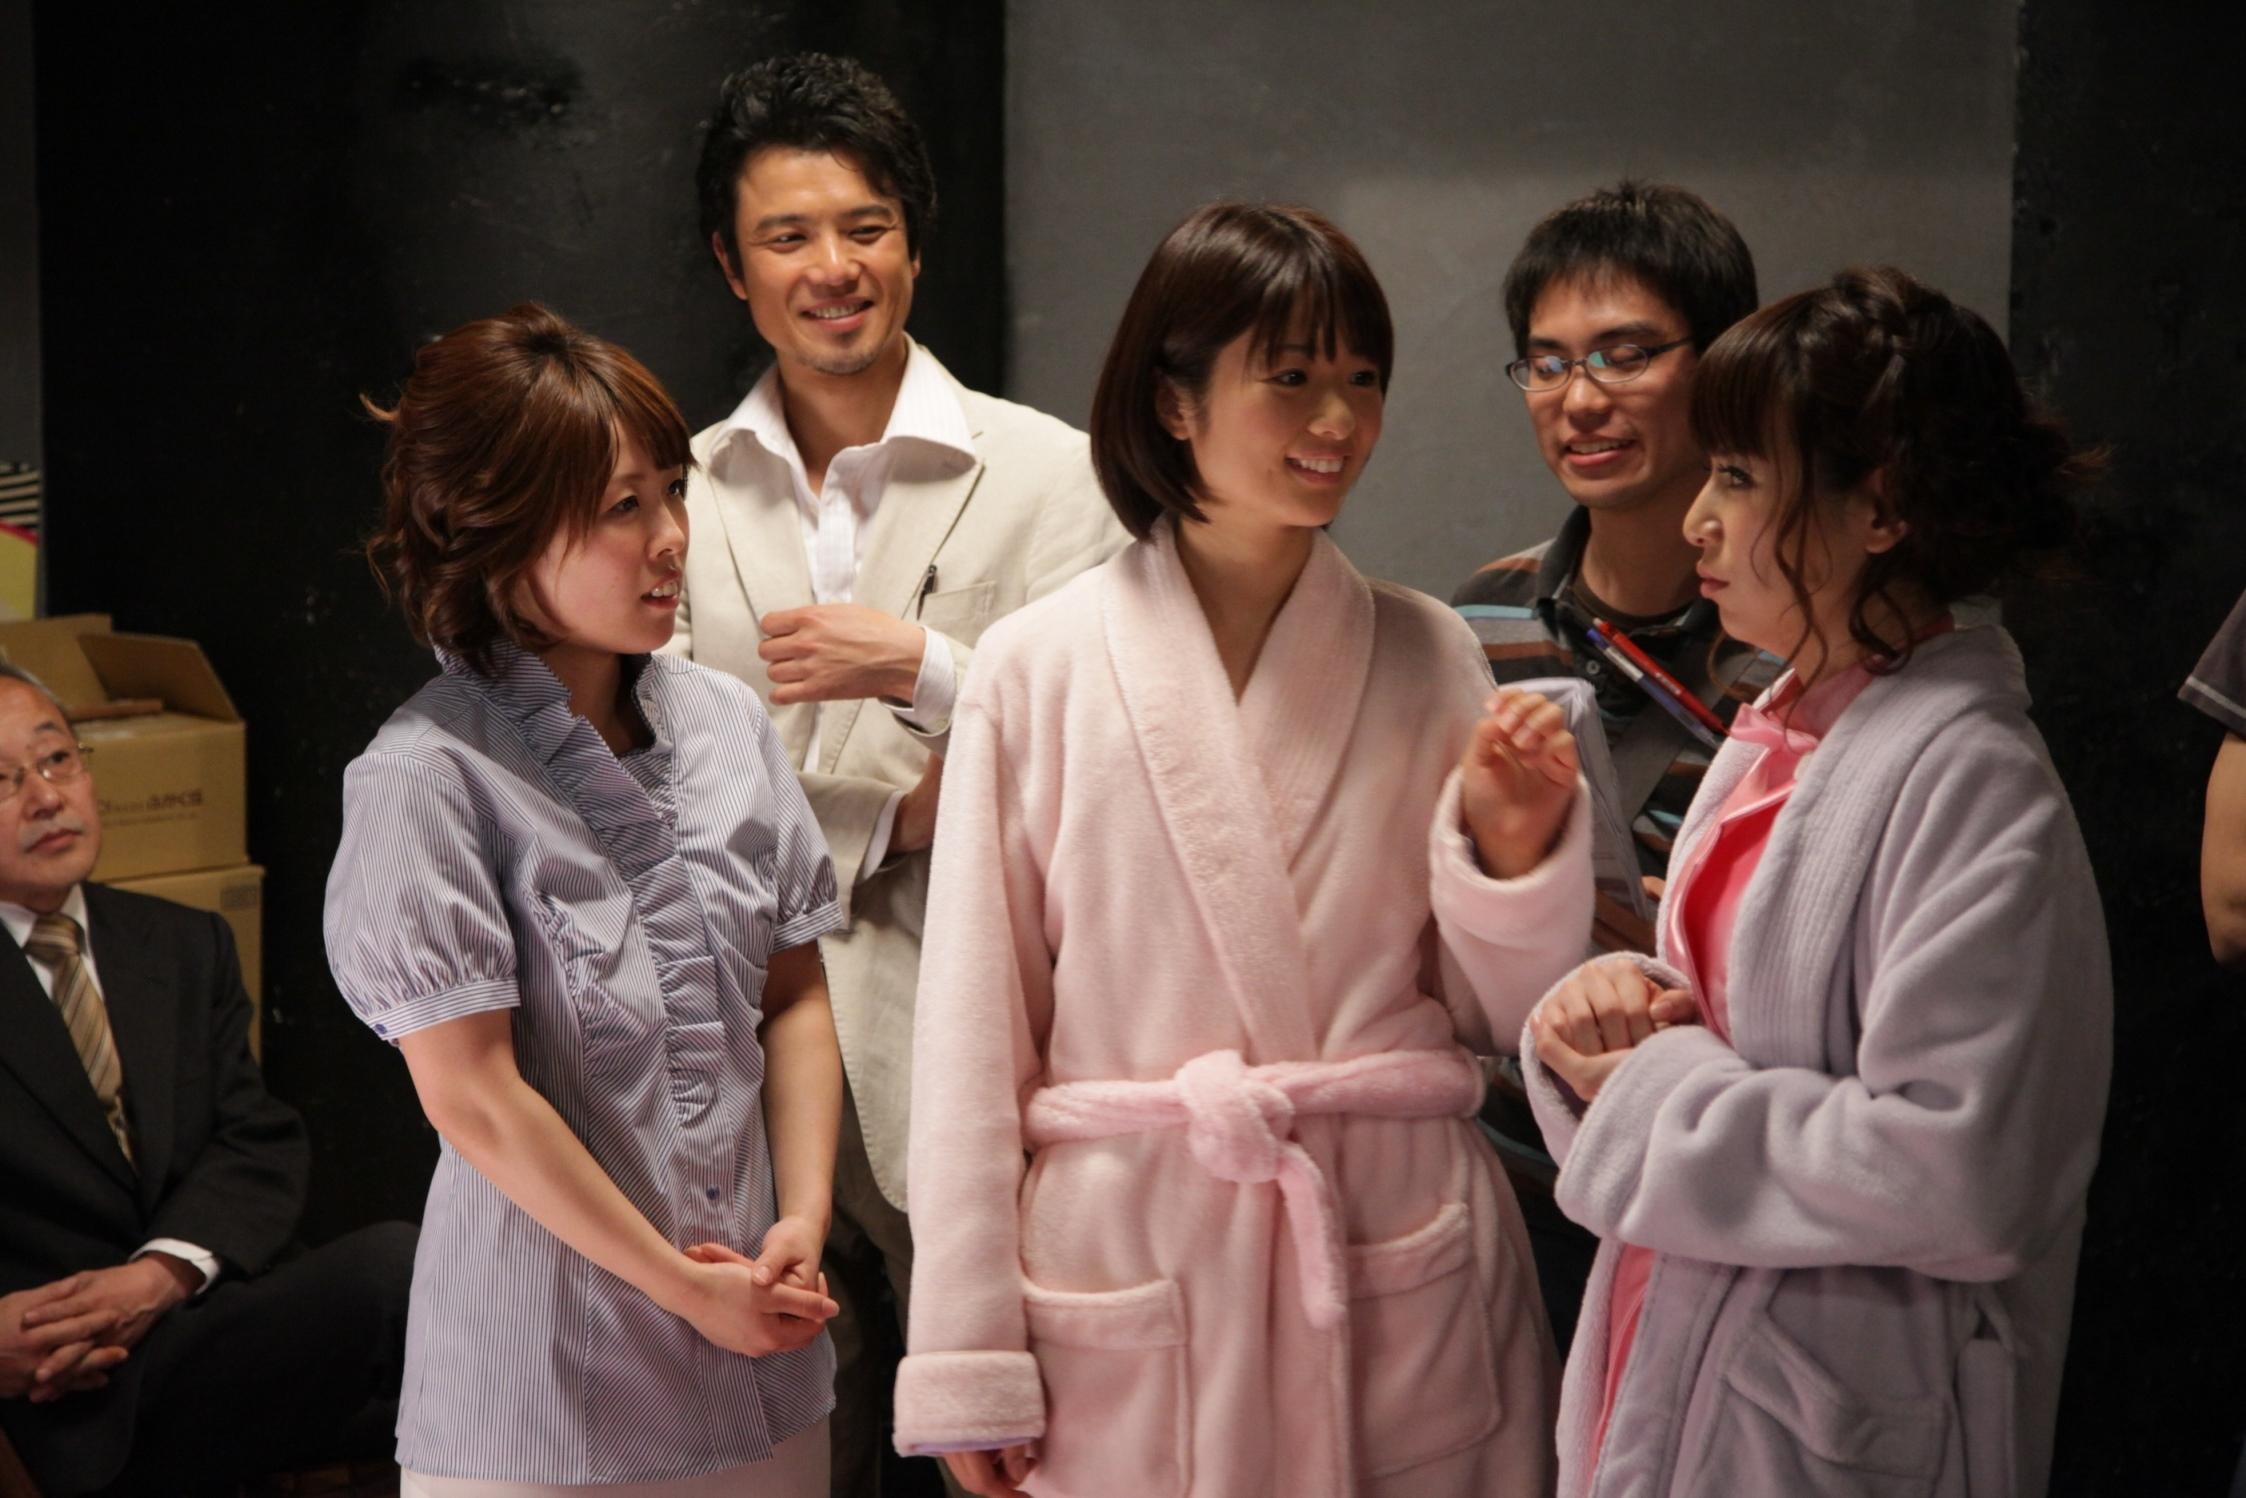 (C)2014 映画『メイクルーム』製作委員会